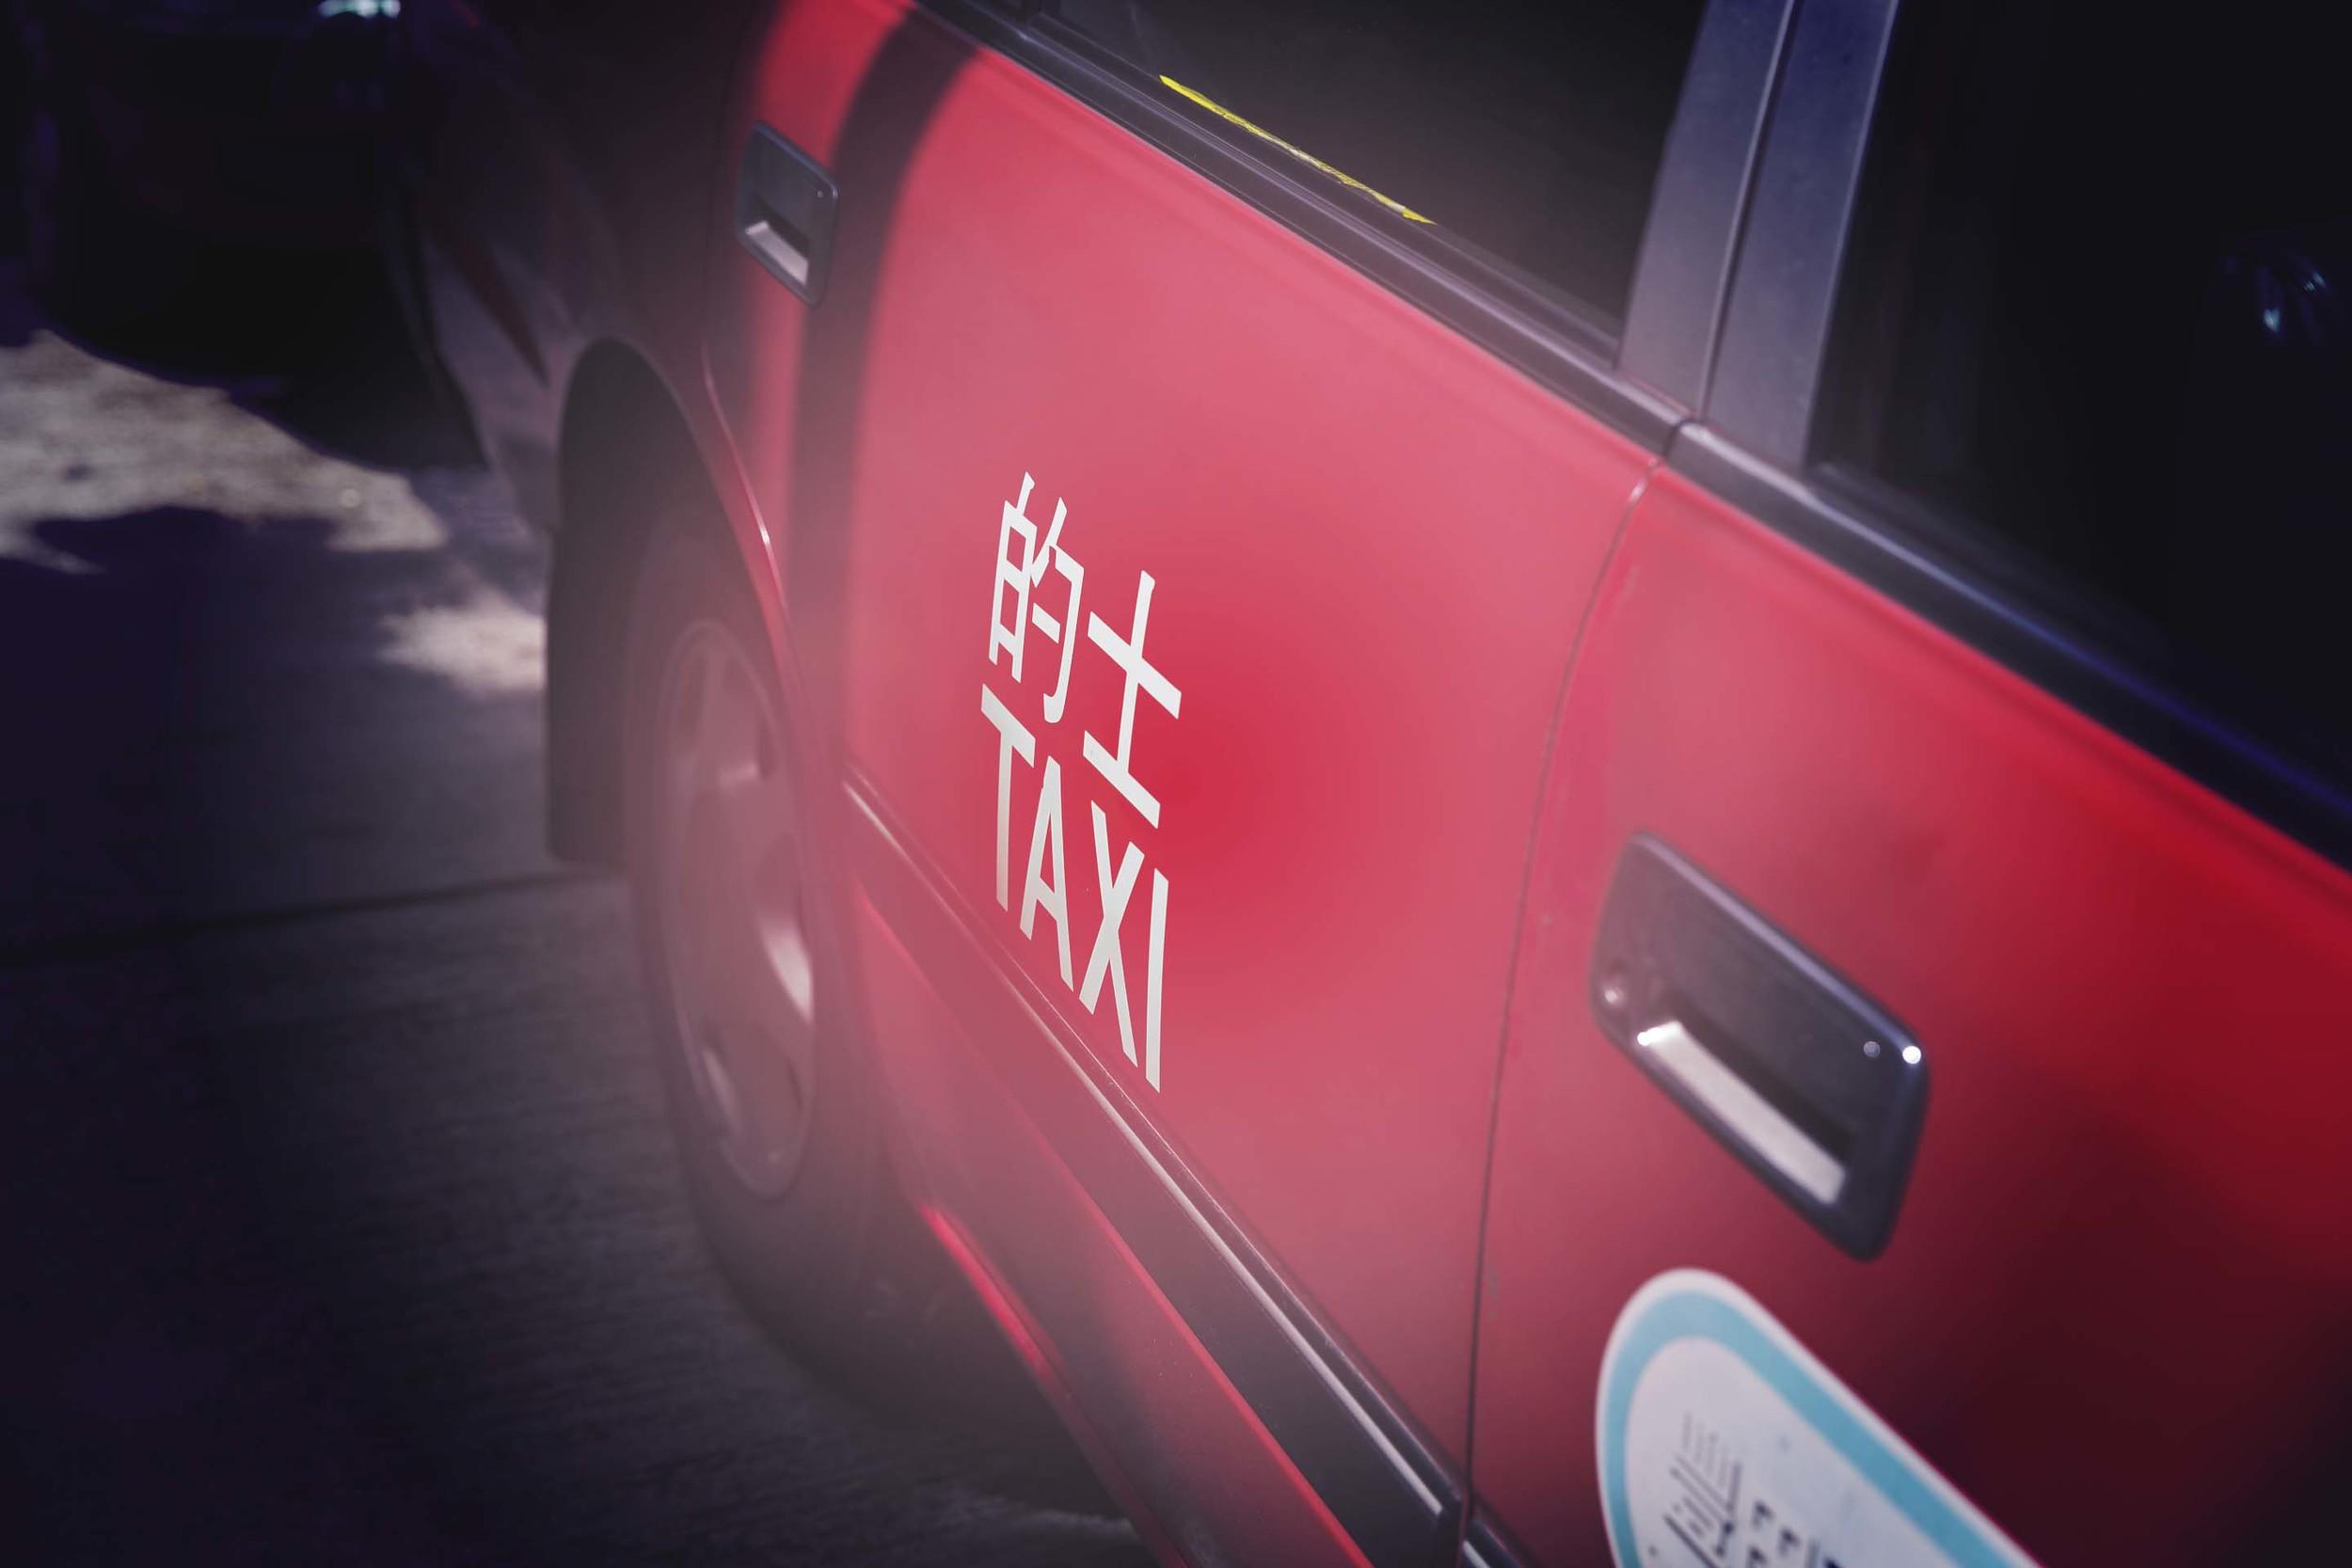 HK Taxi.jpg